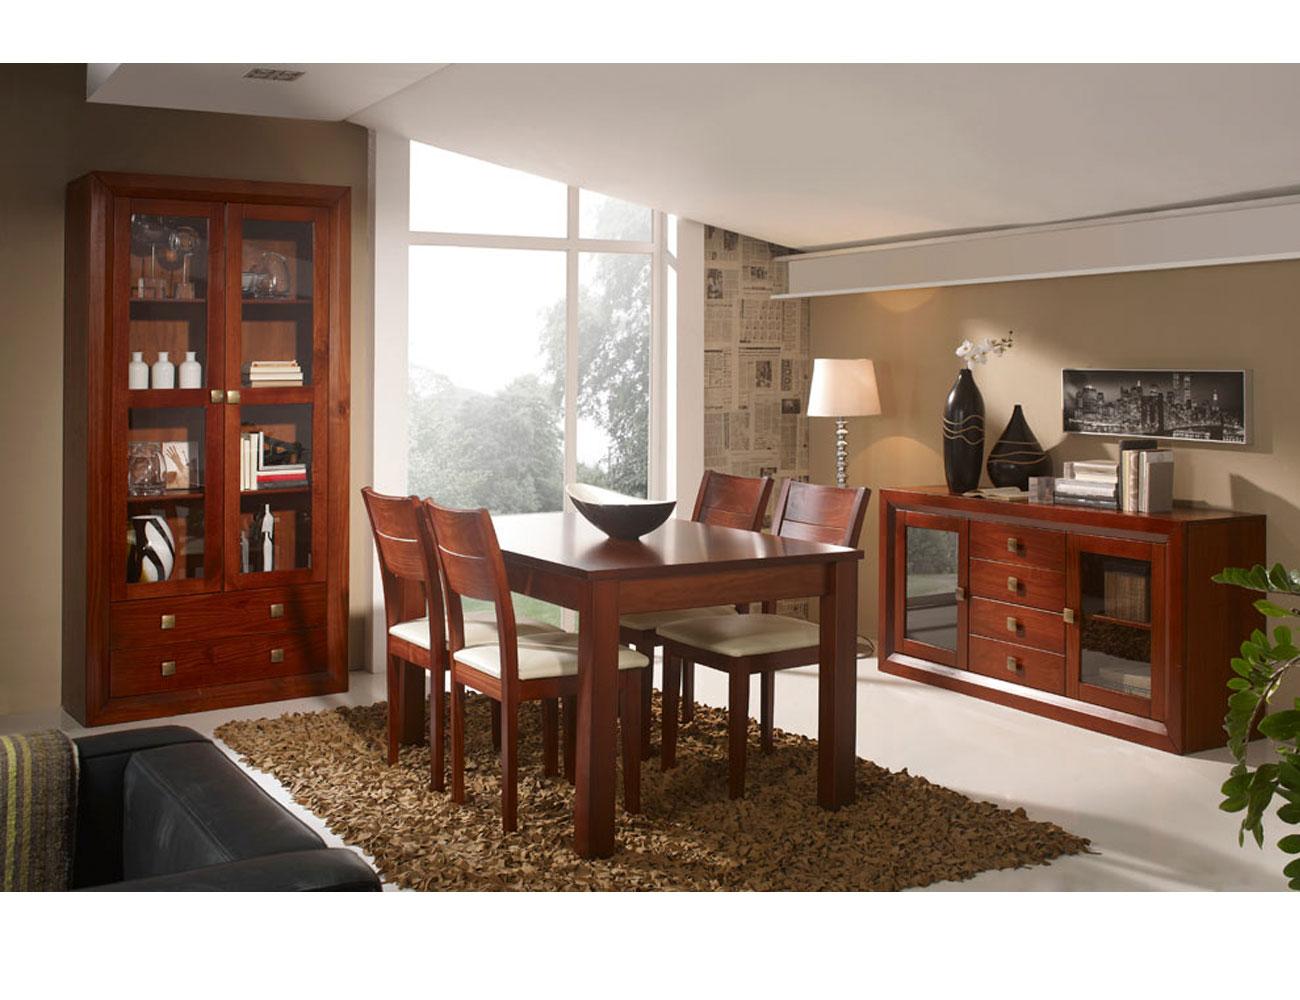 Muebles salon comedor nogal madera dm vitrina aparador mesa extensible sillas1